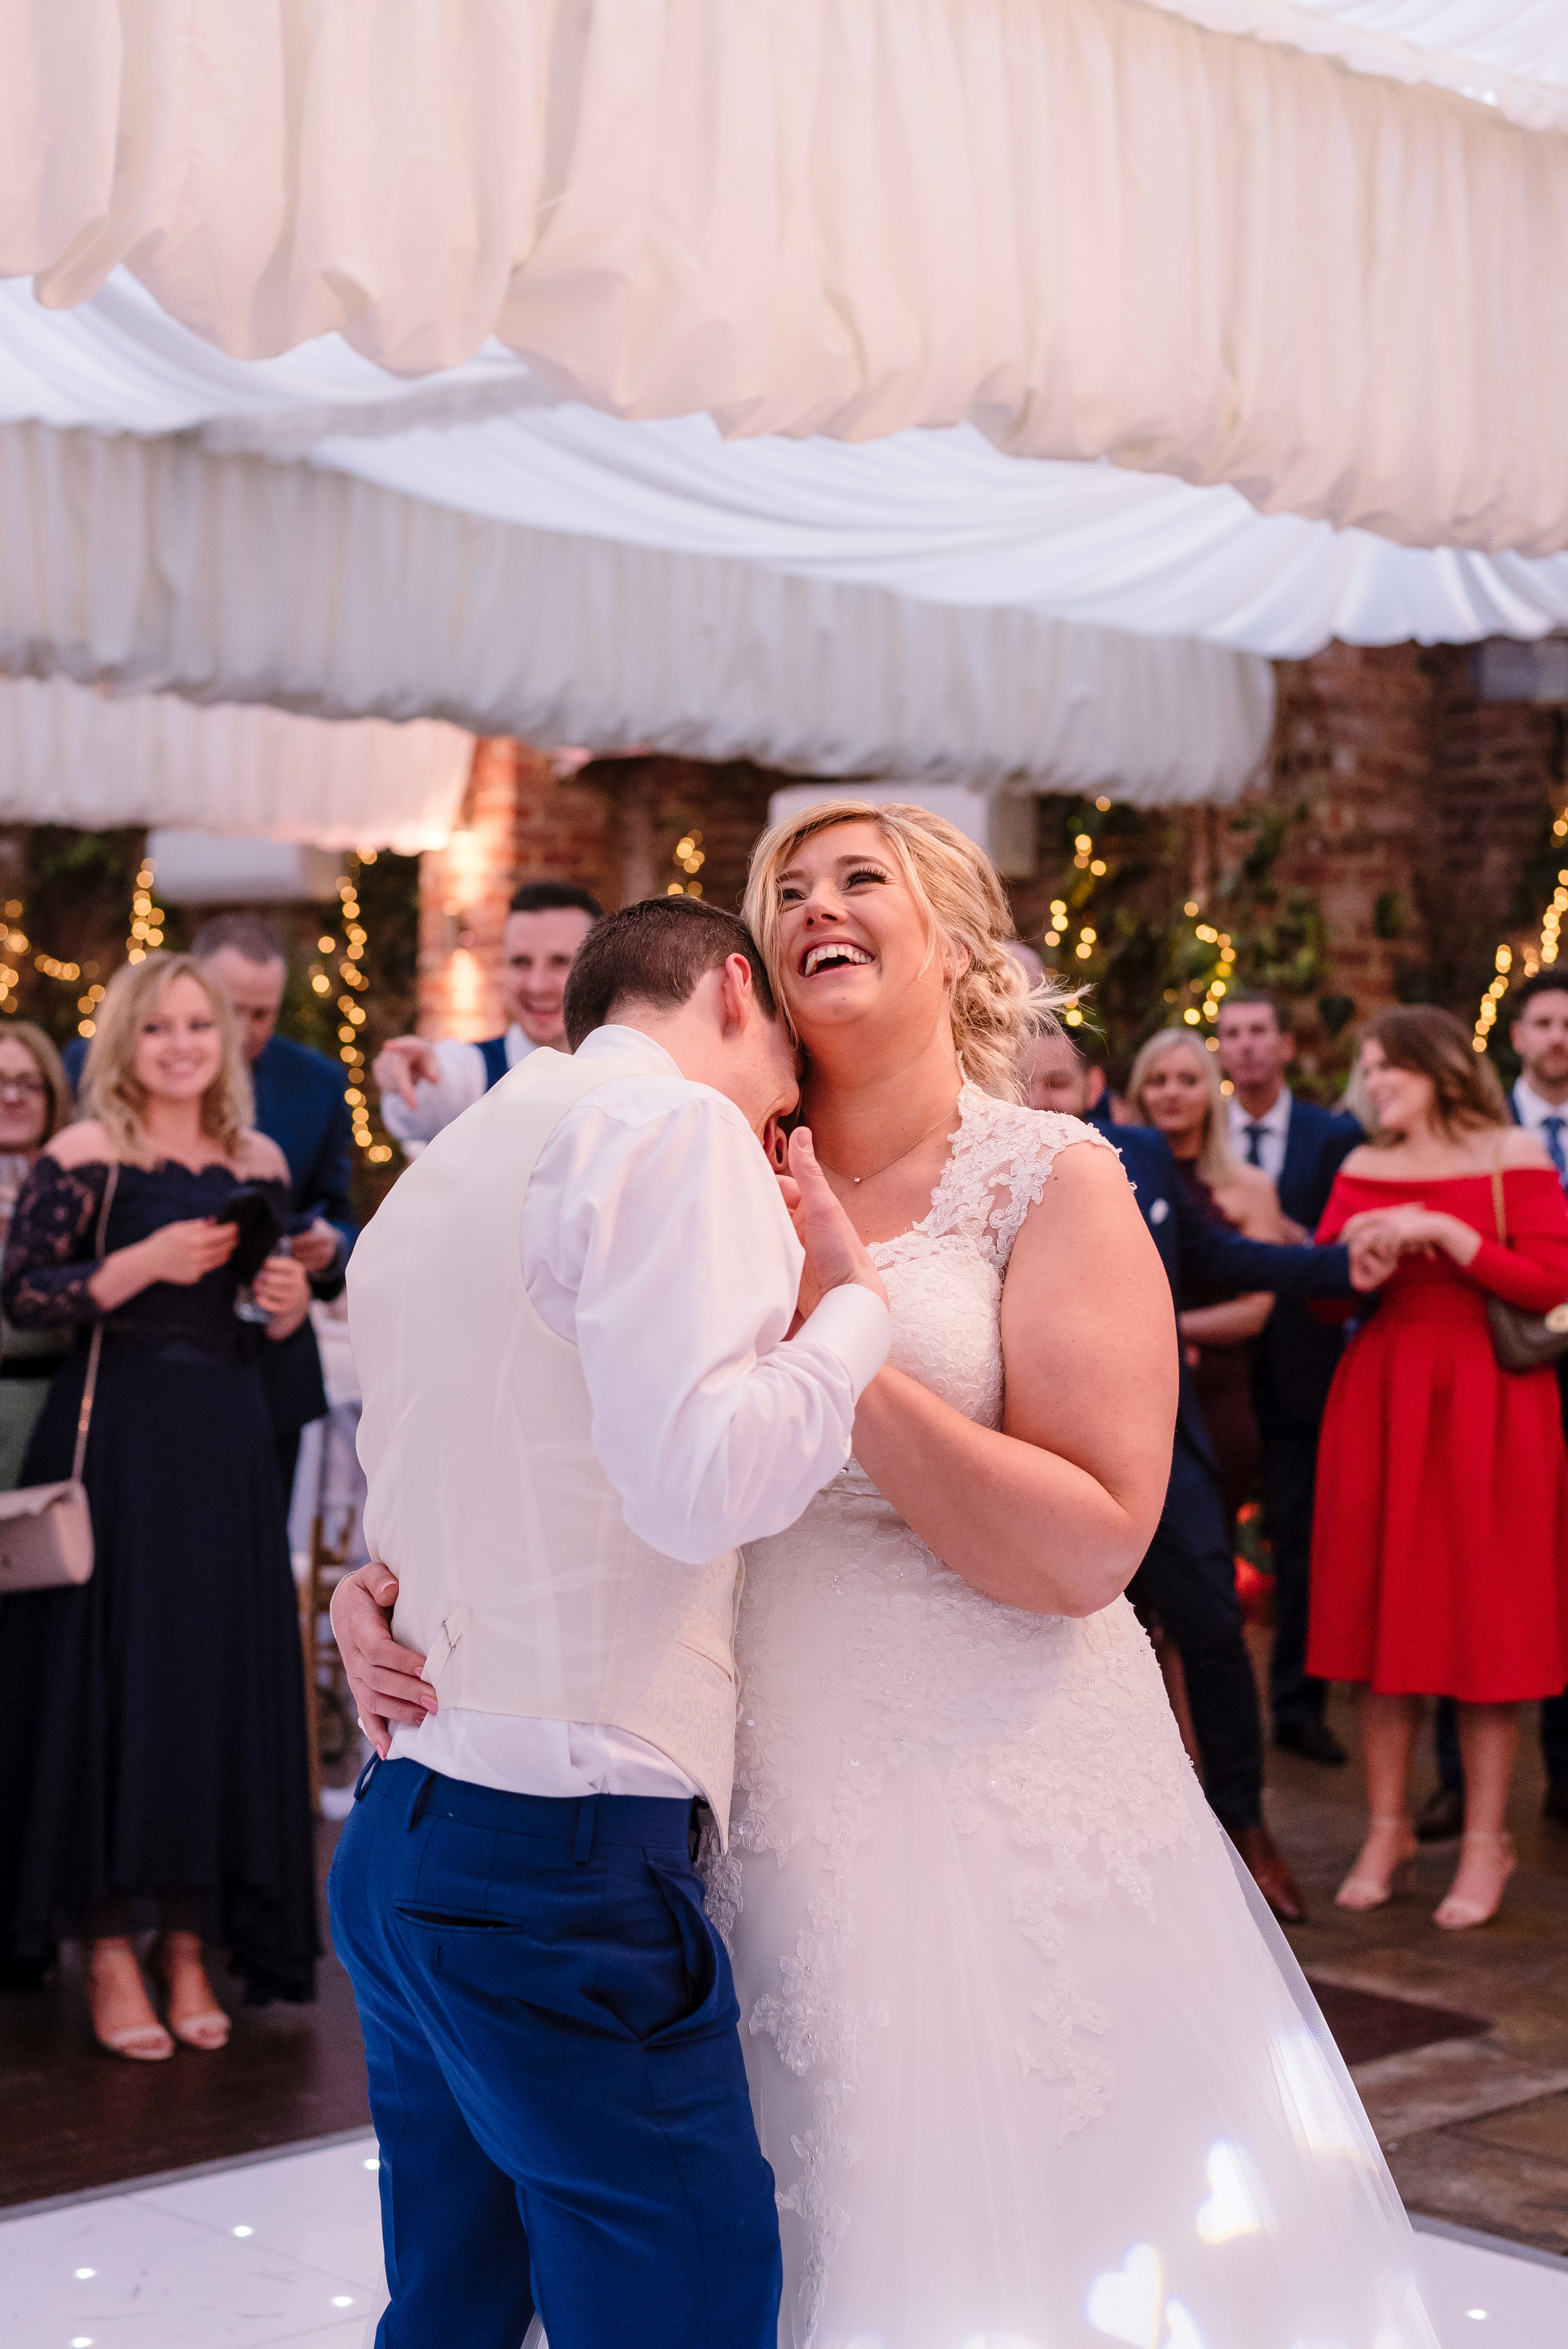 Sarah-Fishlock-Photography : Hampshire-wedding-photographer-hampshire : fleet-wedding-photographer-fleet : Northbrook-Park-Wedding-Photographer : Northbrook-Park-Wedding-Venue : natural-wedding-photographer-hampshire-1100.jpg